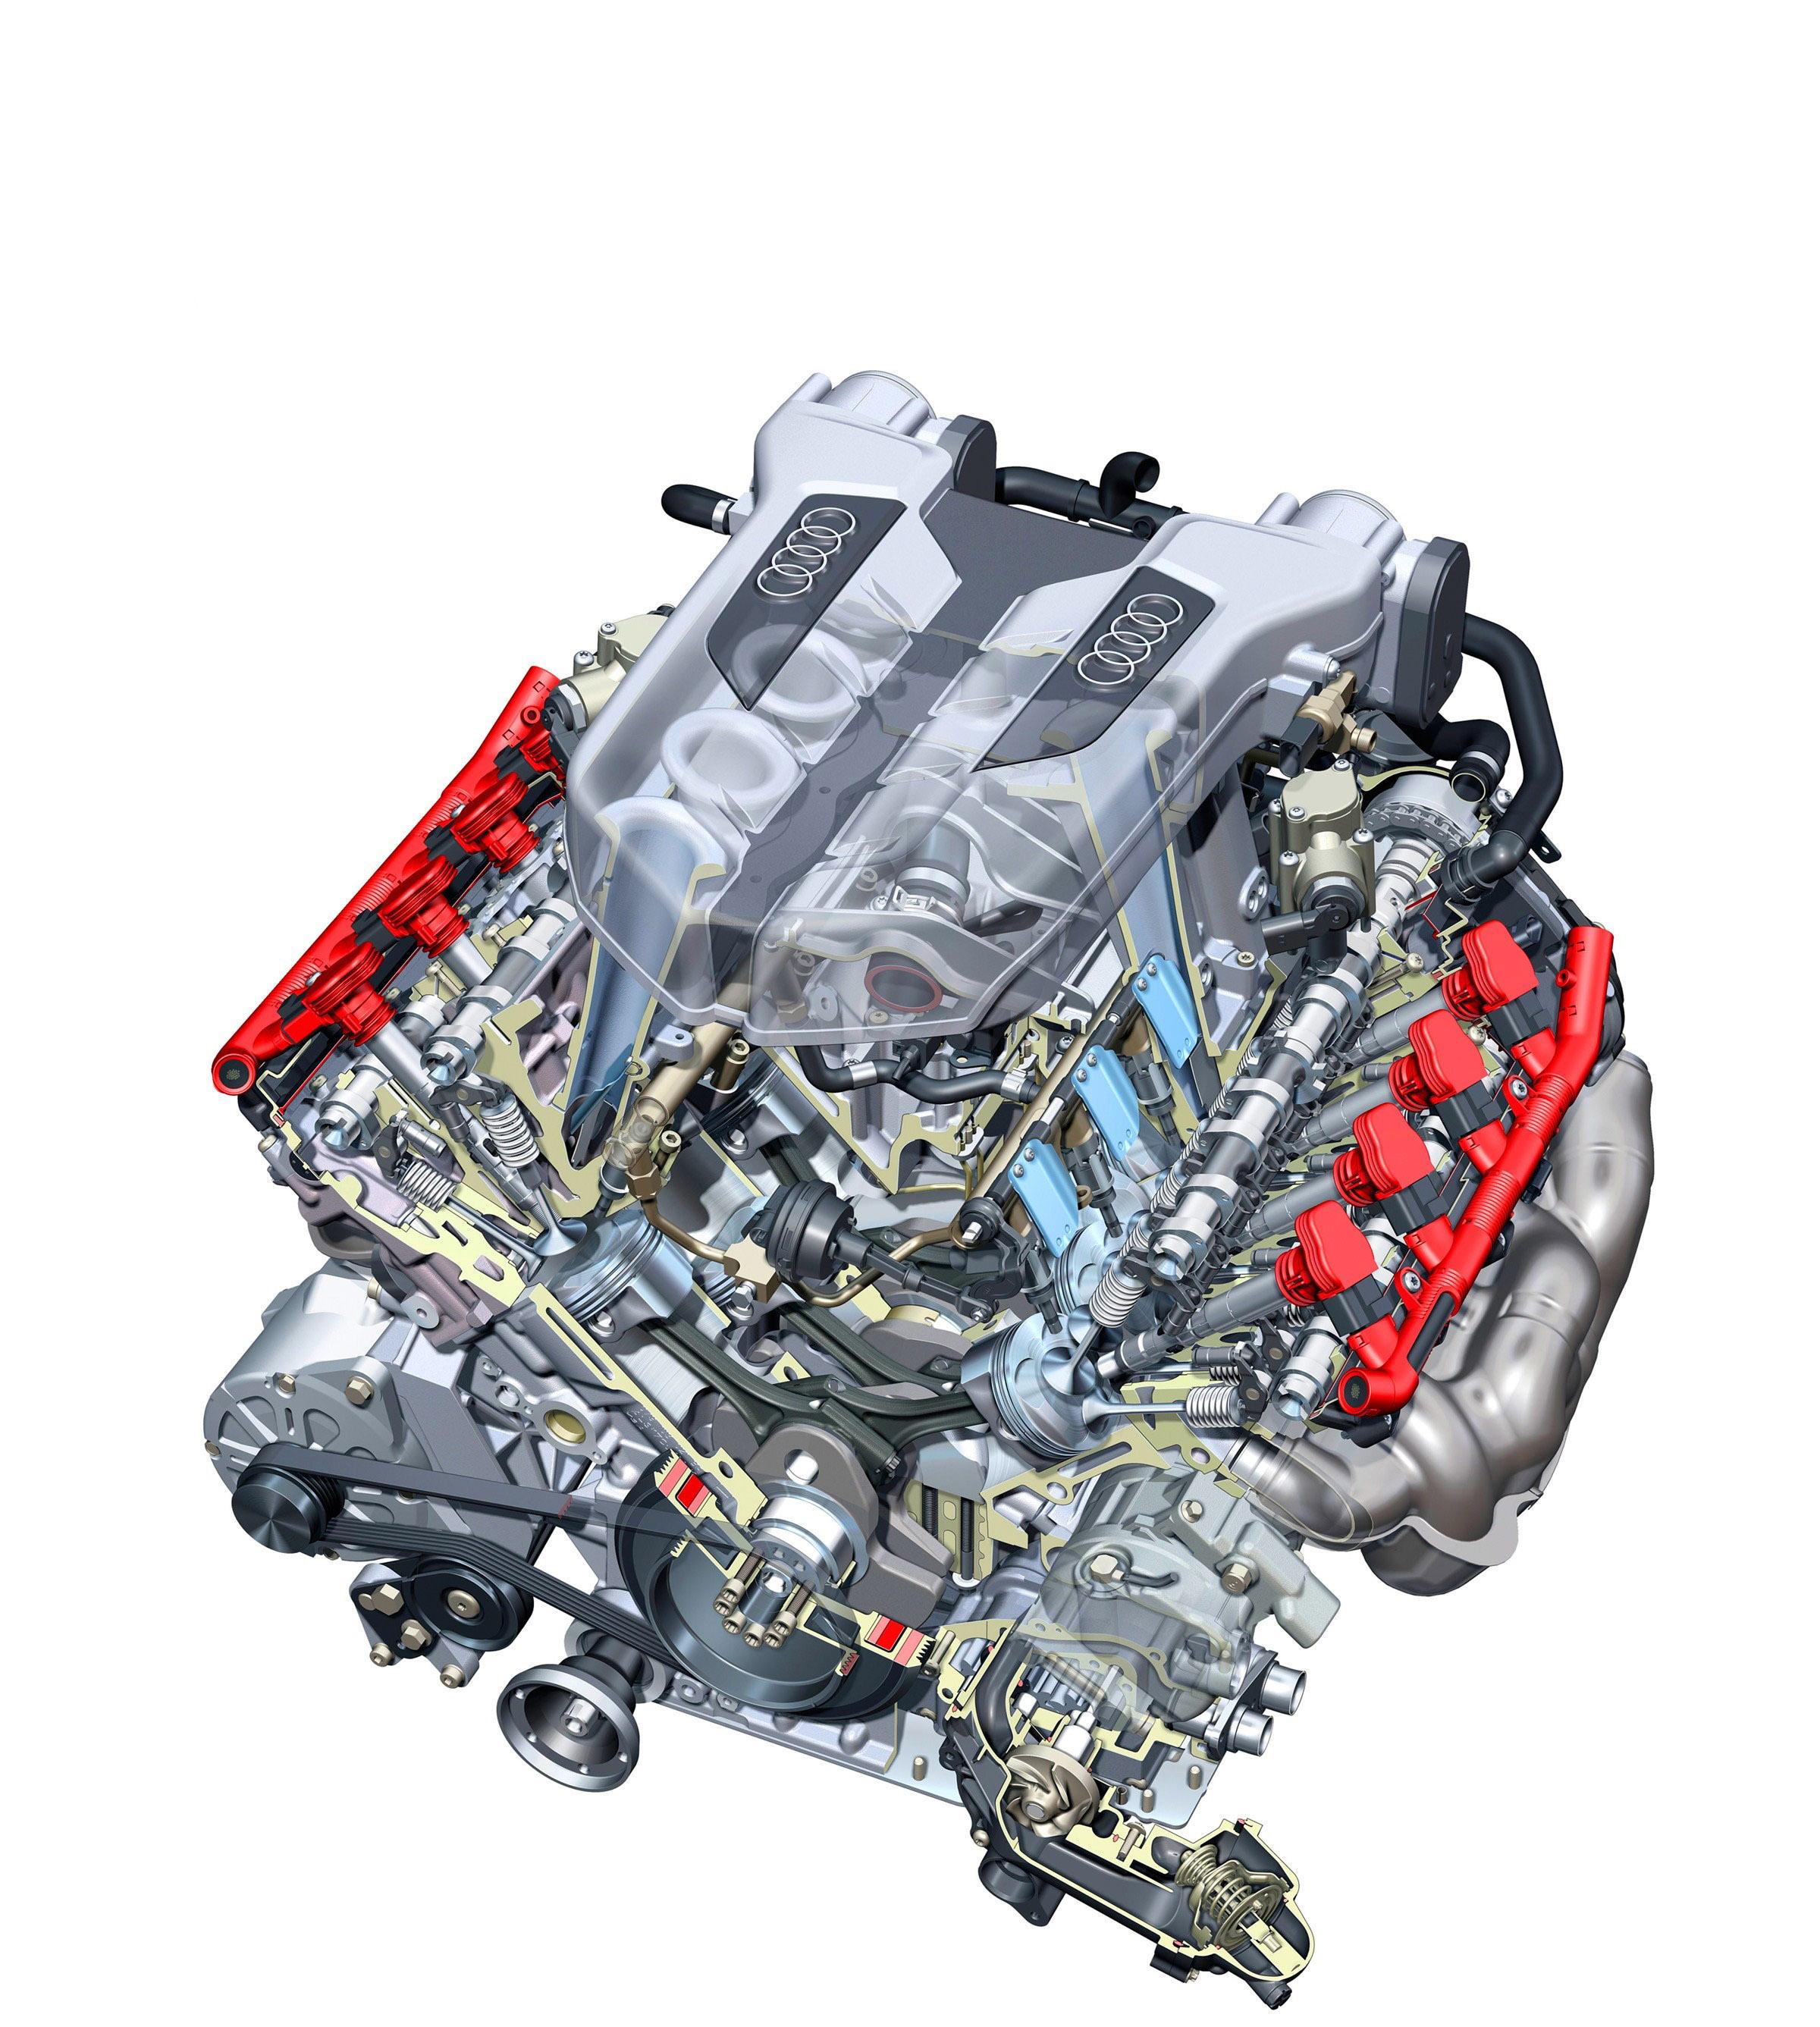 2010 Audi A8 Engine Diagram Transmission Car Wiring Diagrams R8 Schematic U2022 Rh Arcomics Co 2007 A8l